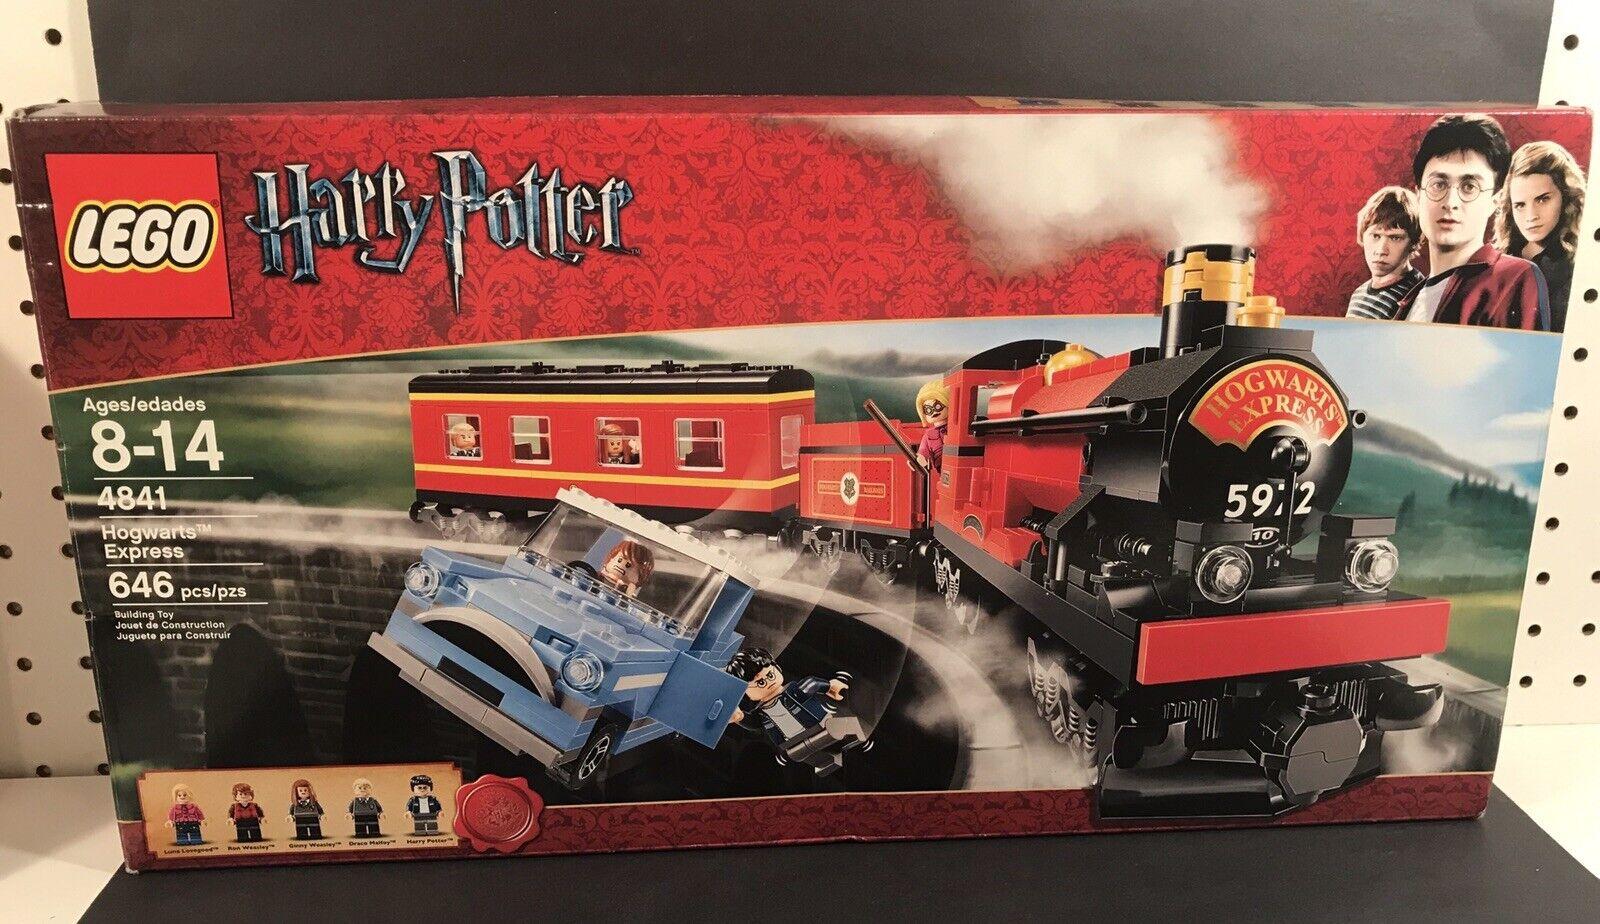 2010 LEGO HARRY POTTER HOGWARTS EXPRESS LEGO  SET 4841 WITH scatola VERY RARE RETIrosso  nelle promozioni dello stadio